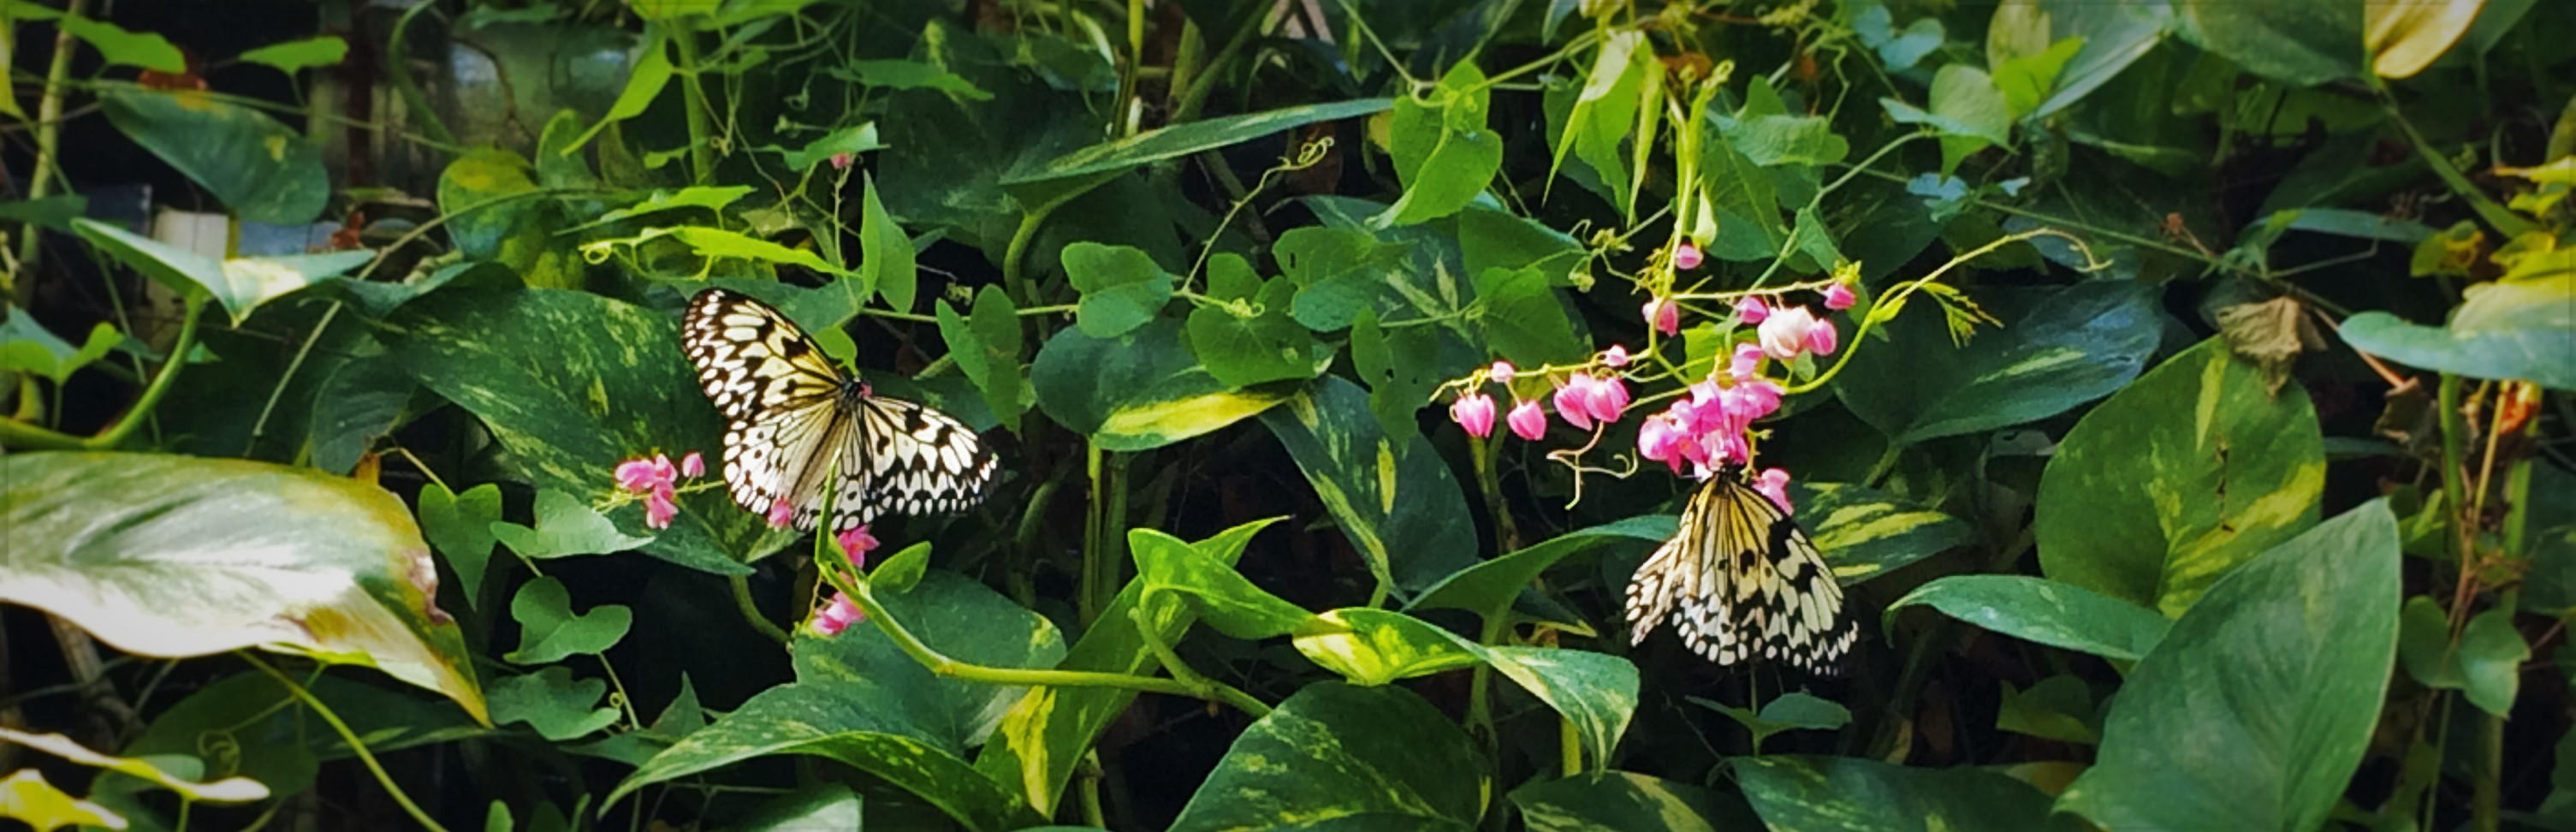 Butterflies at the Butterfly Pavilion Denver Colorado 1